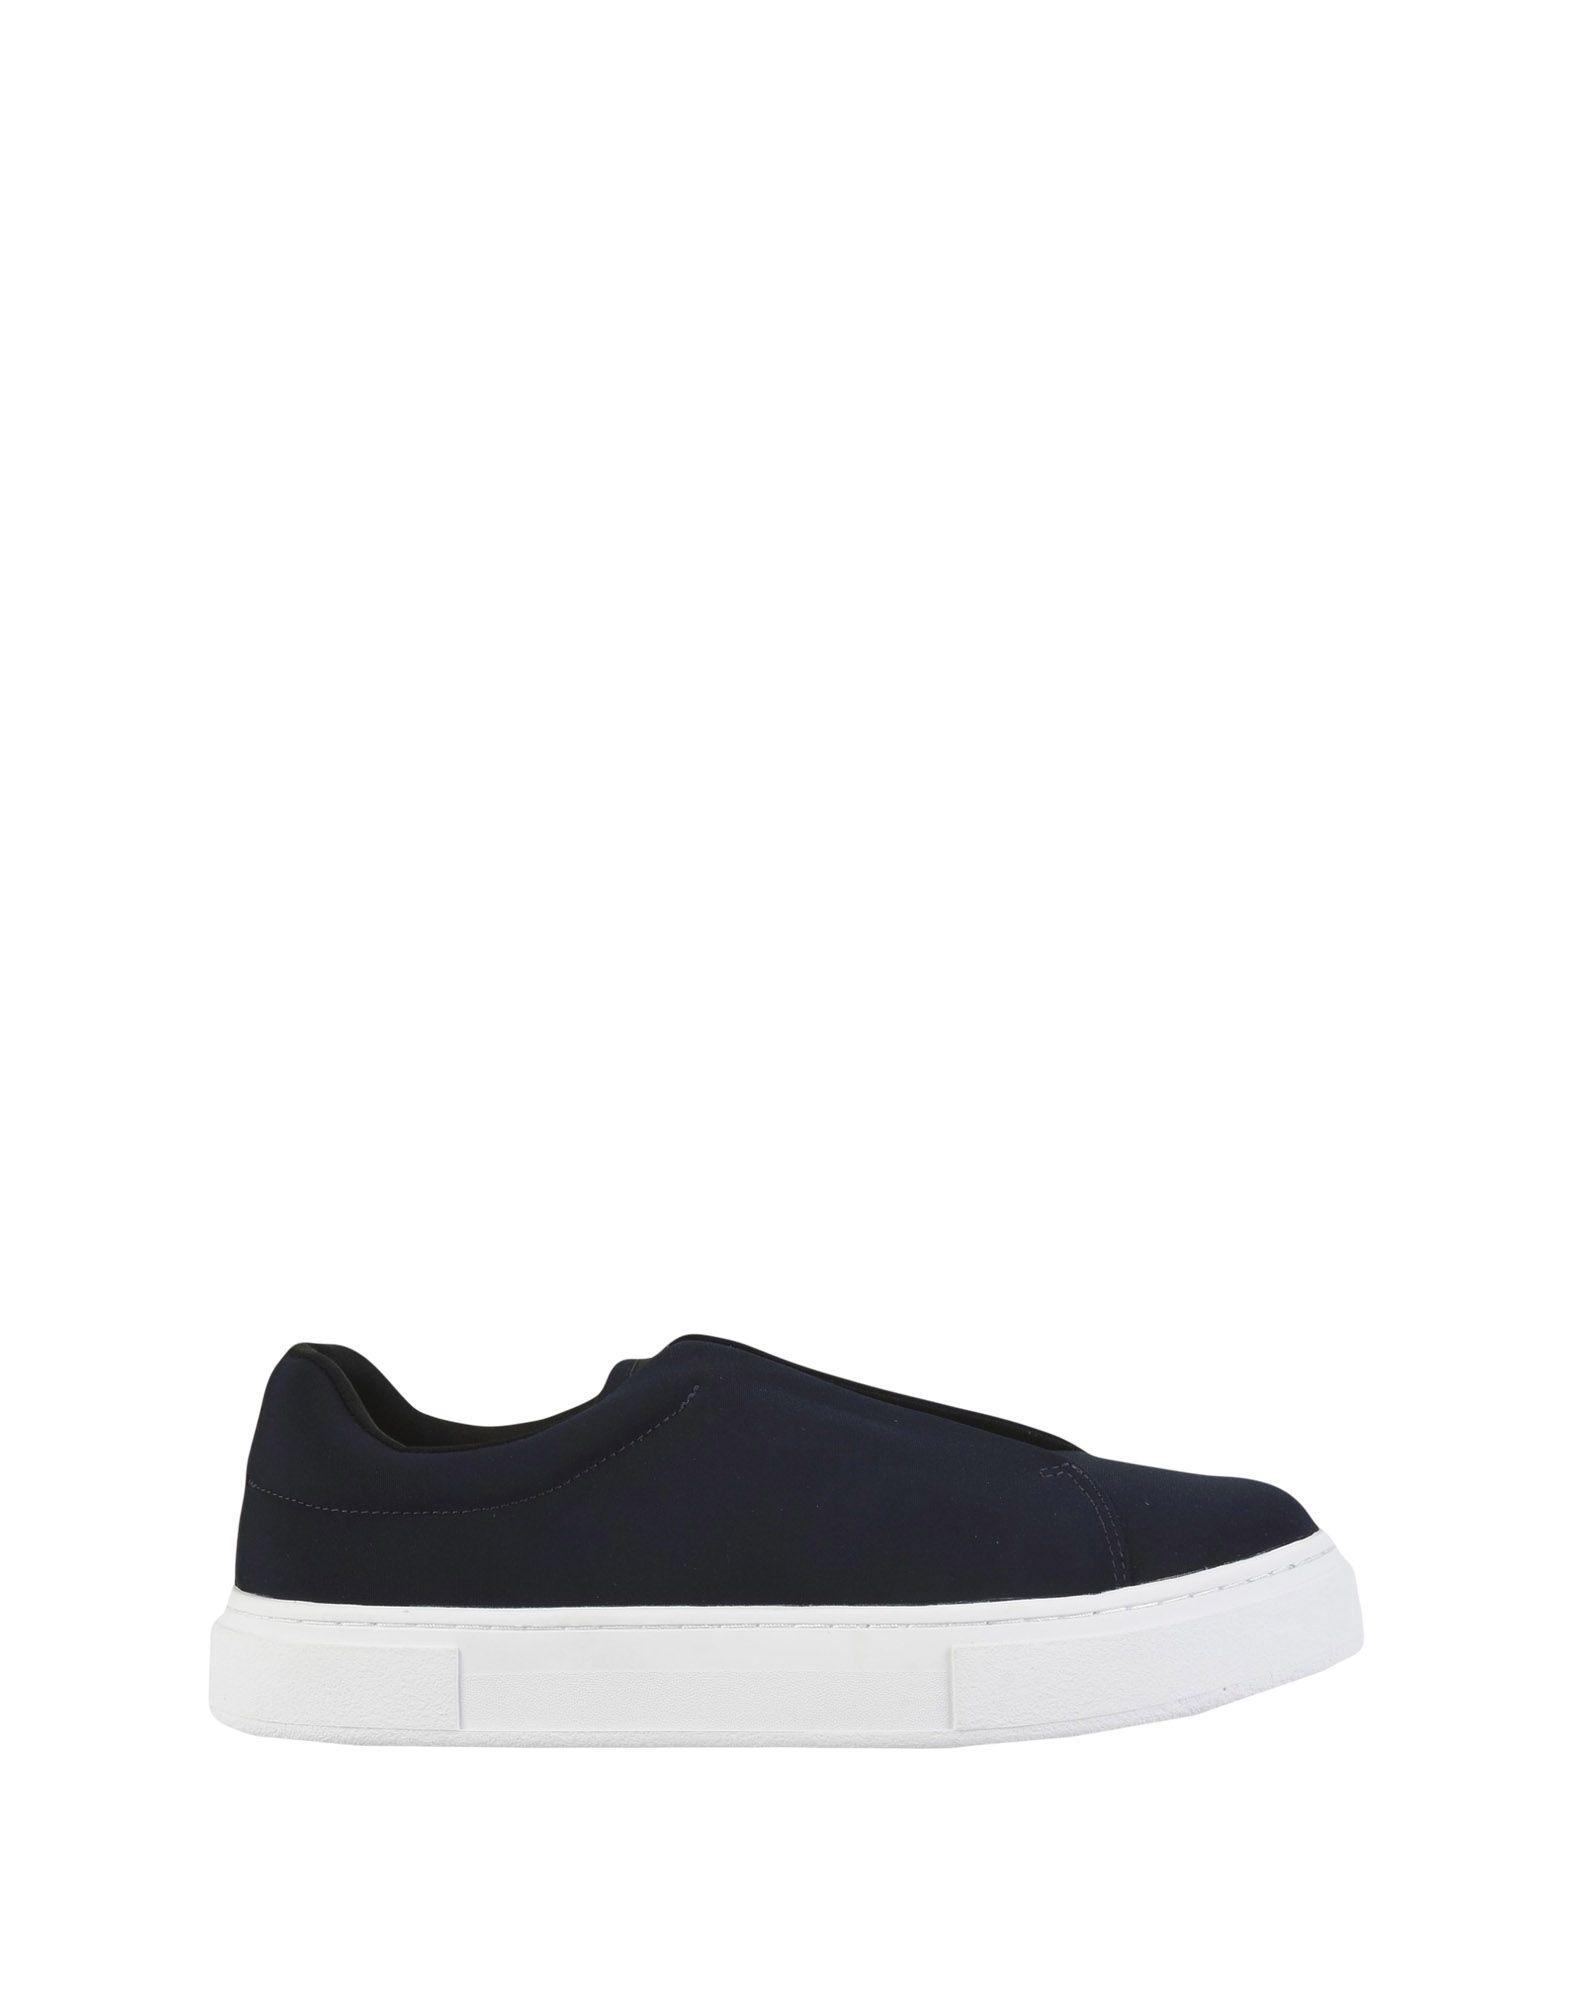 Eytys Doja S 11248646JQ 11248646JQ 11248646JQ Gute Qualität beliebte Schuhe 226c78